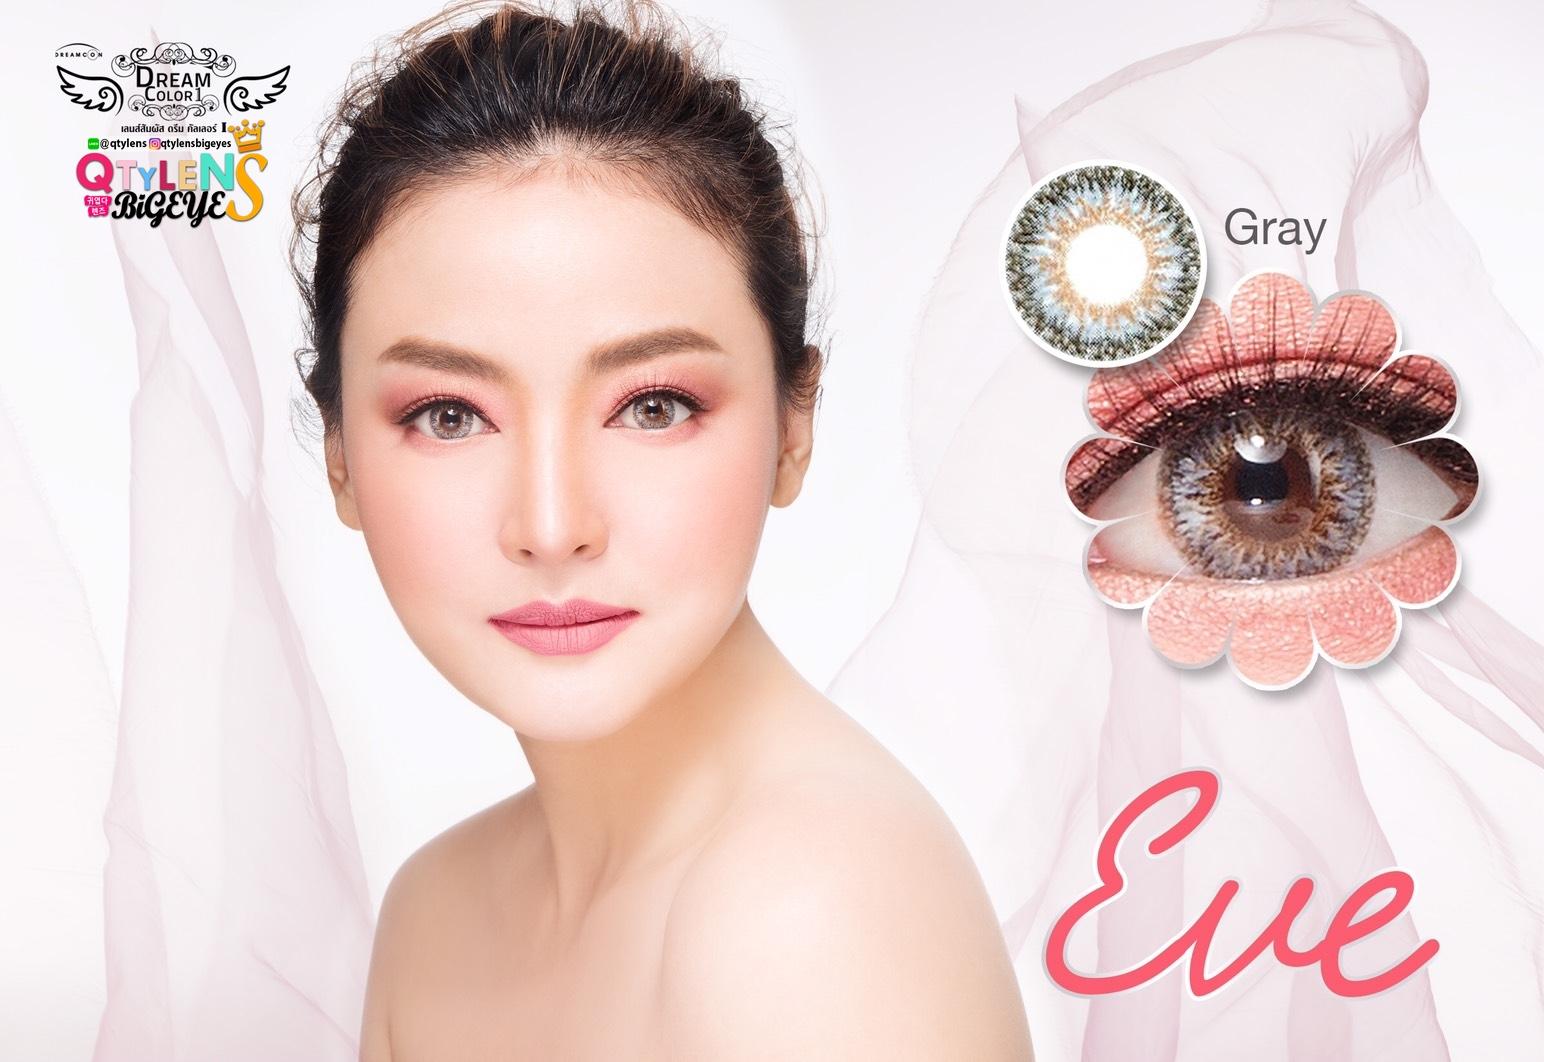 Eve Gray